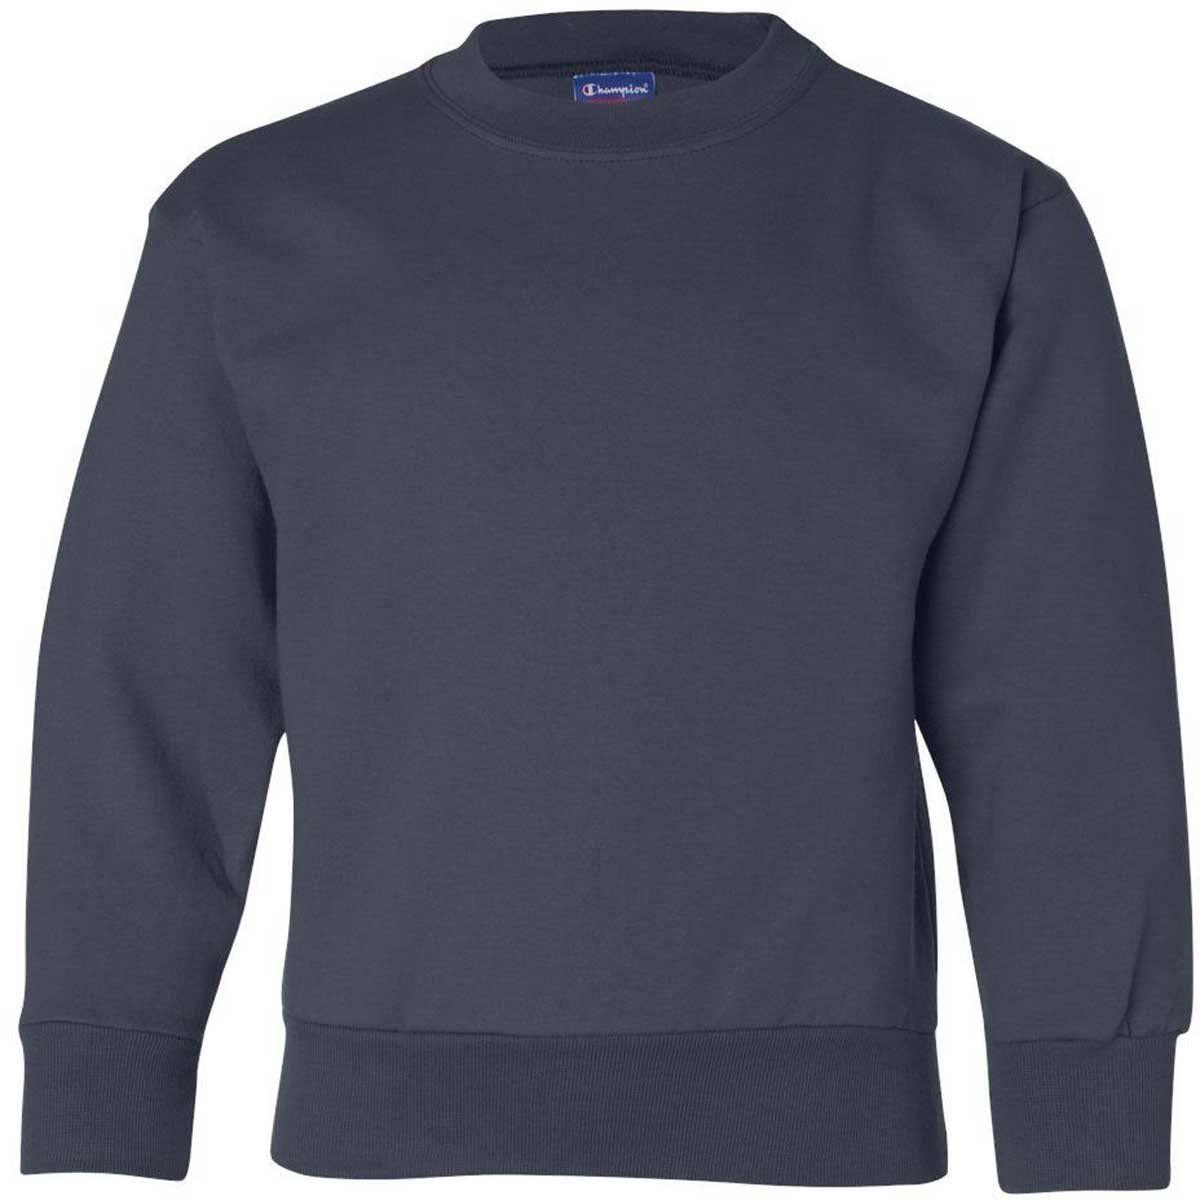 Champion Youth Navy Eco 9 Ounce Crew Custom Embroidered Shirts Personalized Sweatshirt Sweatshirts [ 1200 x 1200 Pixel ]